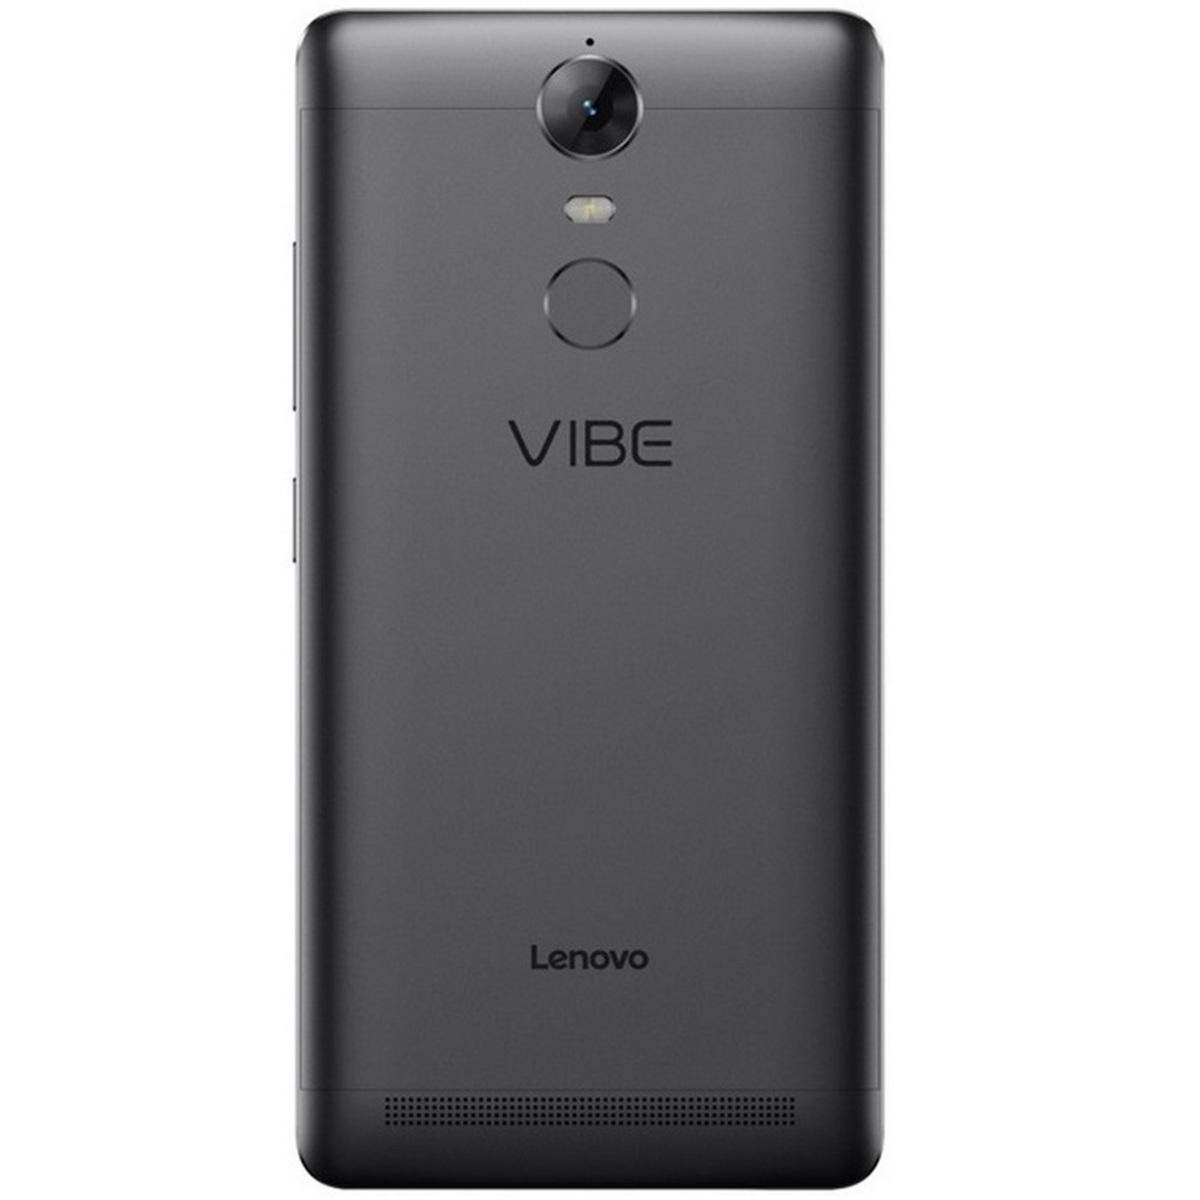 Buy Lenovo Vibe K5 Note (A7020) Grey - Smart Phones - Lulu